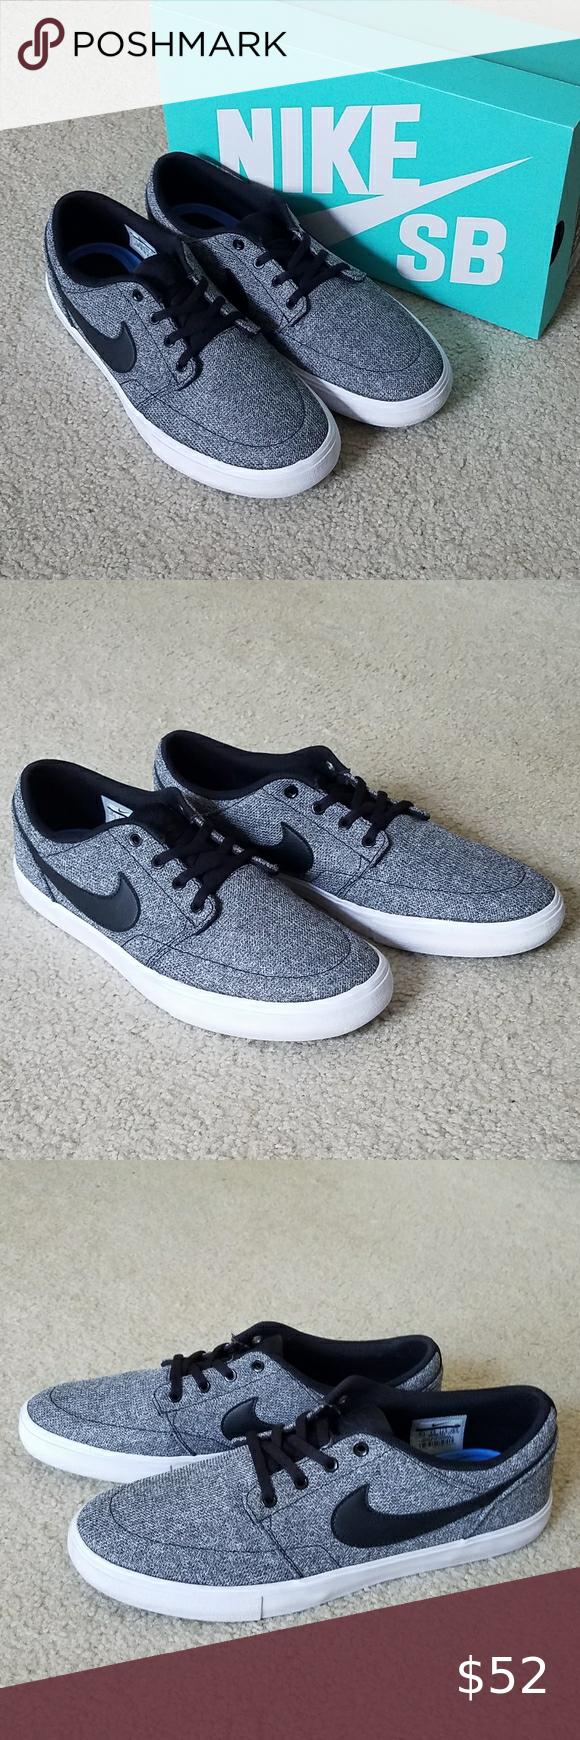 Nike SB Portmore II Skate Shoes - Size 10.5 | Skate shoes, Nike sb ...